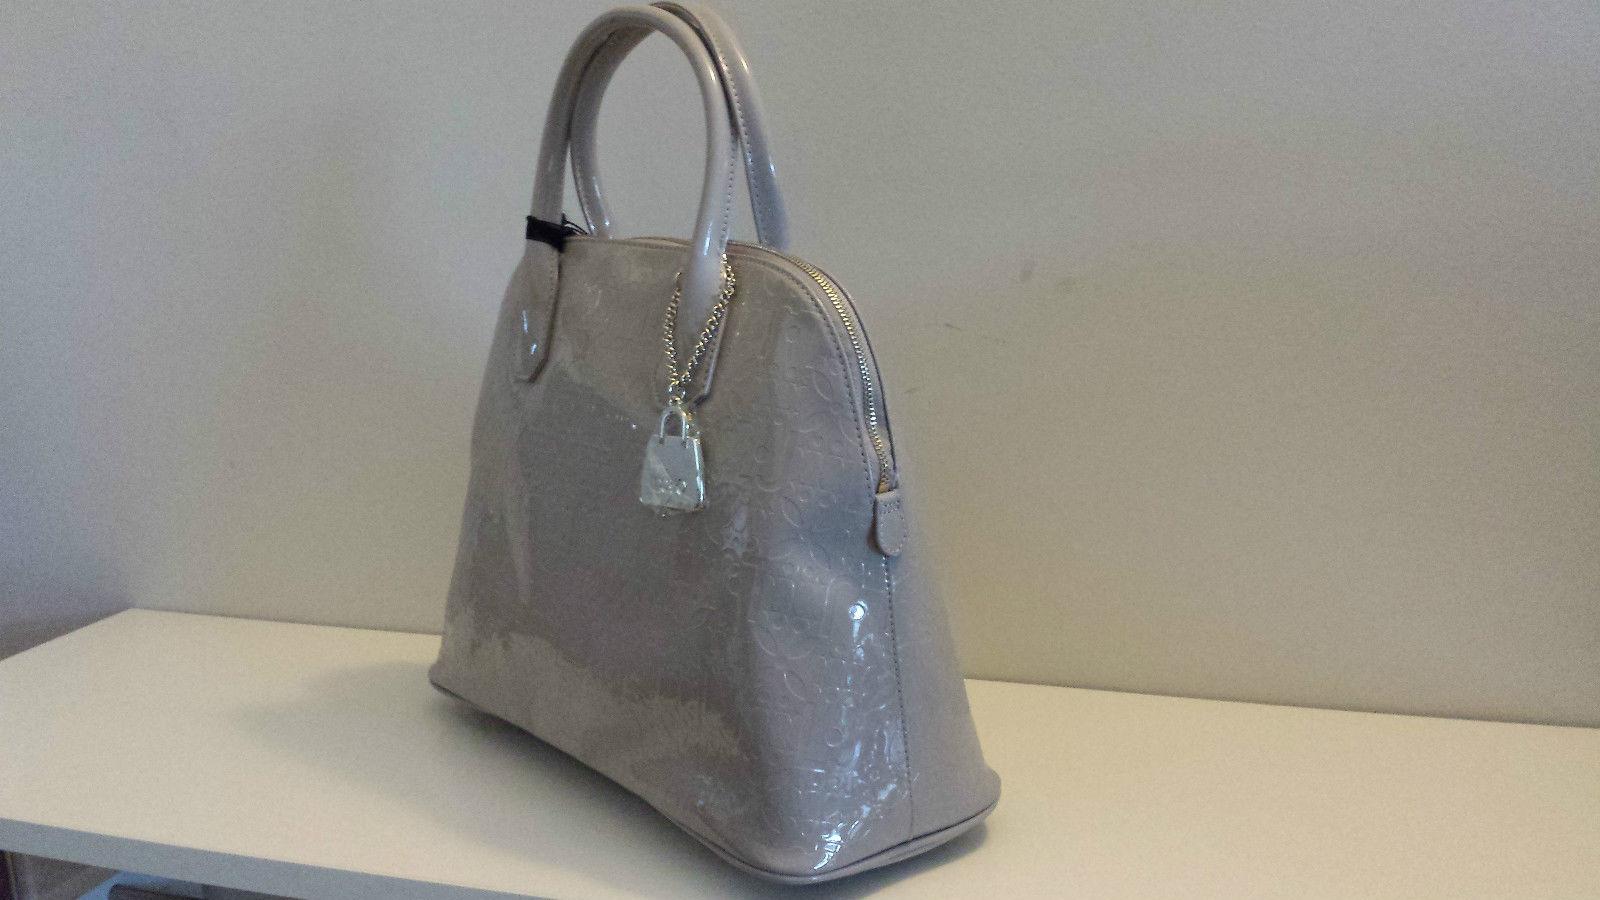 borsa shopping melanie scontata1 2a7af55807a